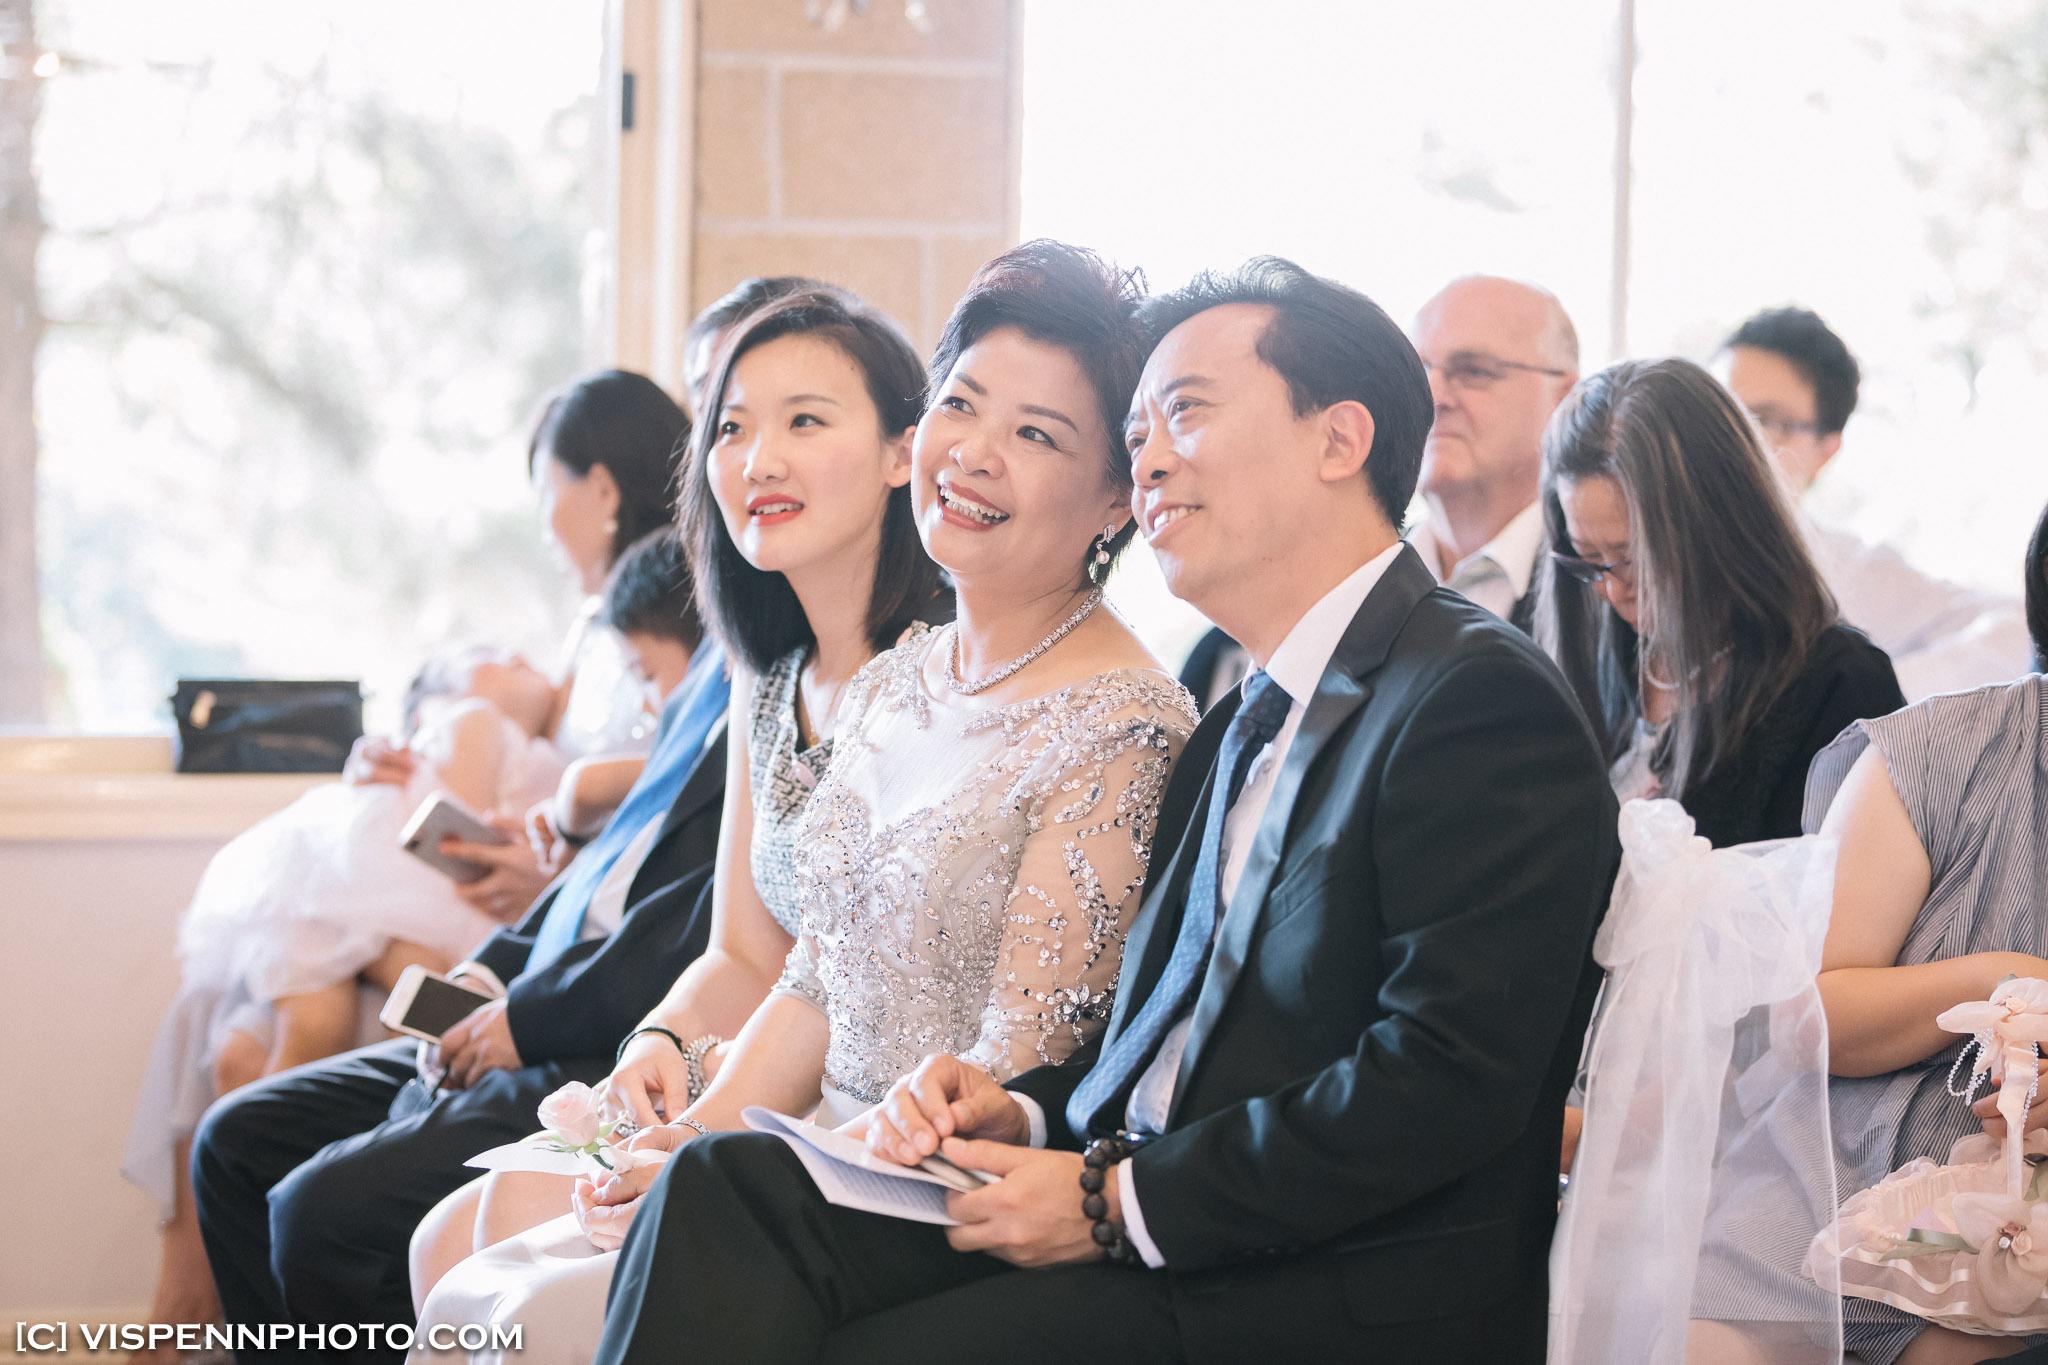 WEDDING DAY Photography Melbourne ZHPENN H4 0301